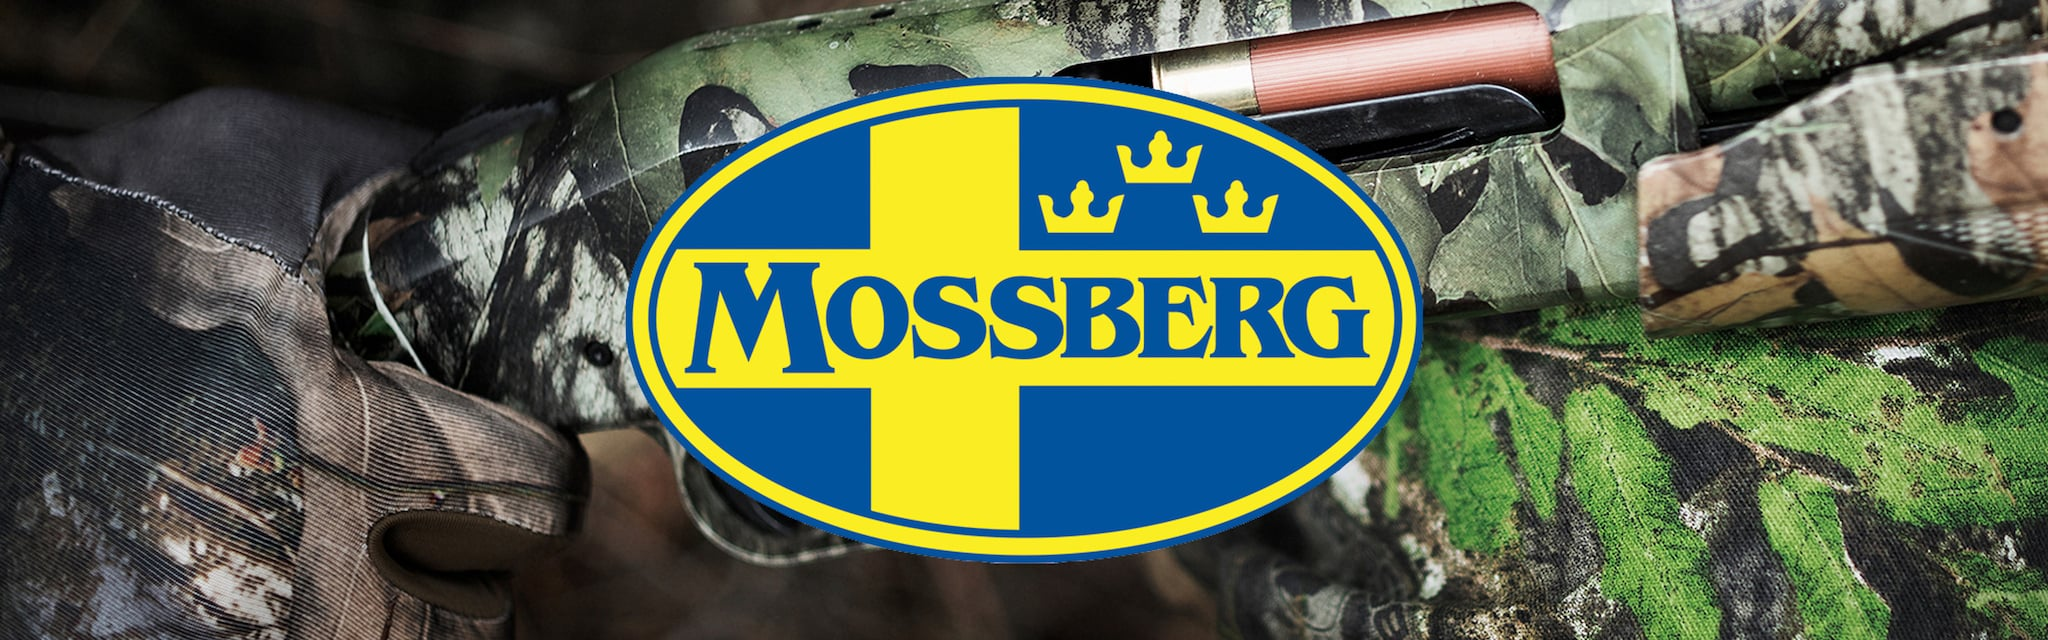 mossberg banner